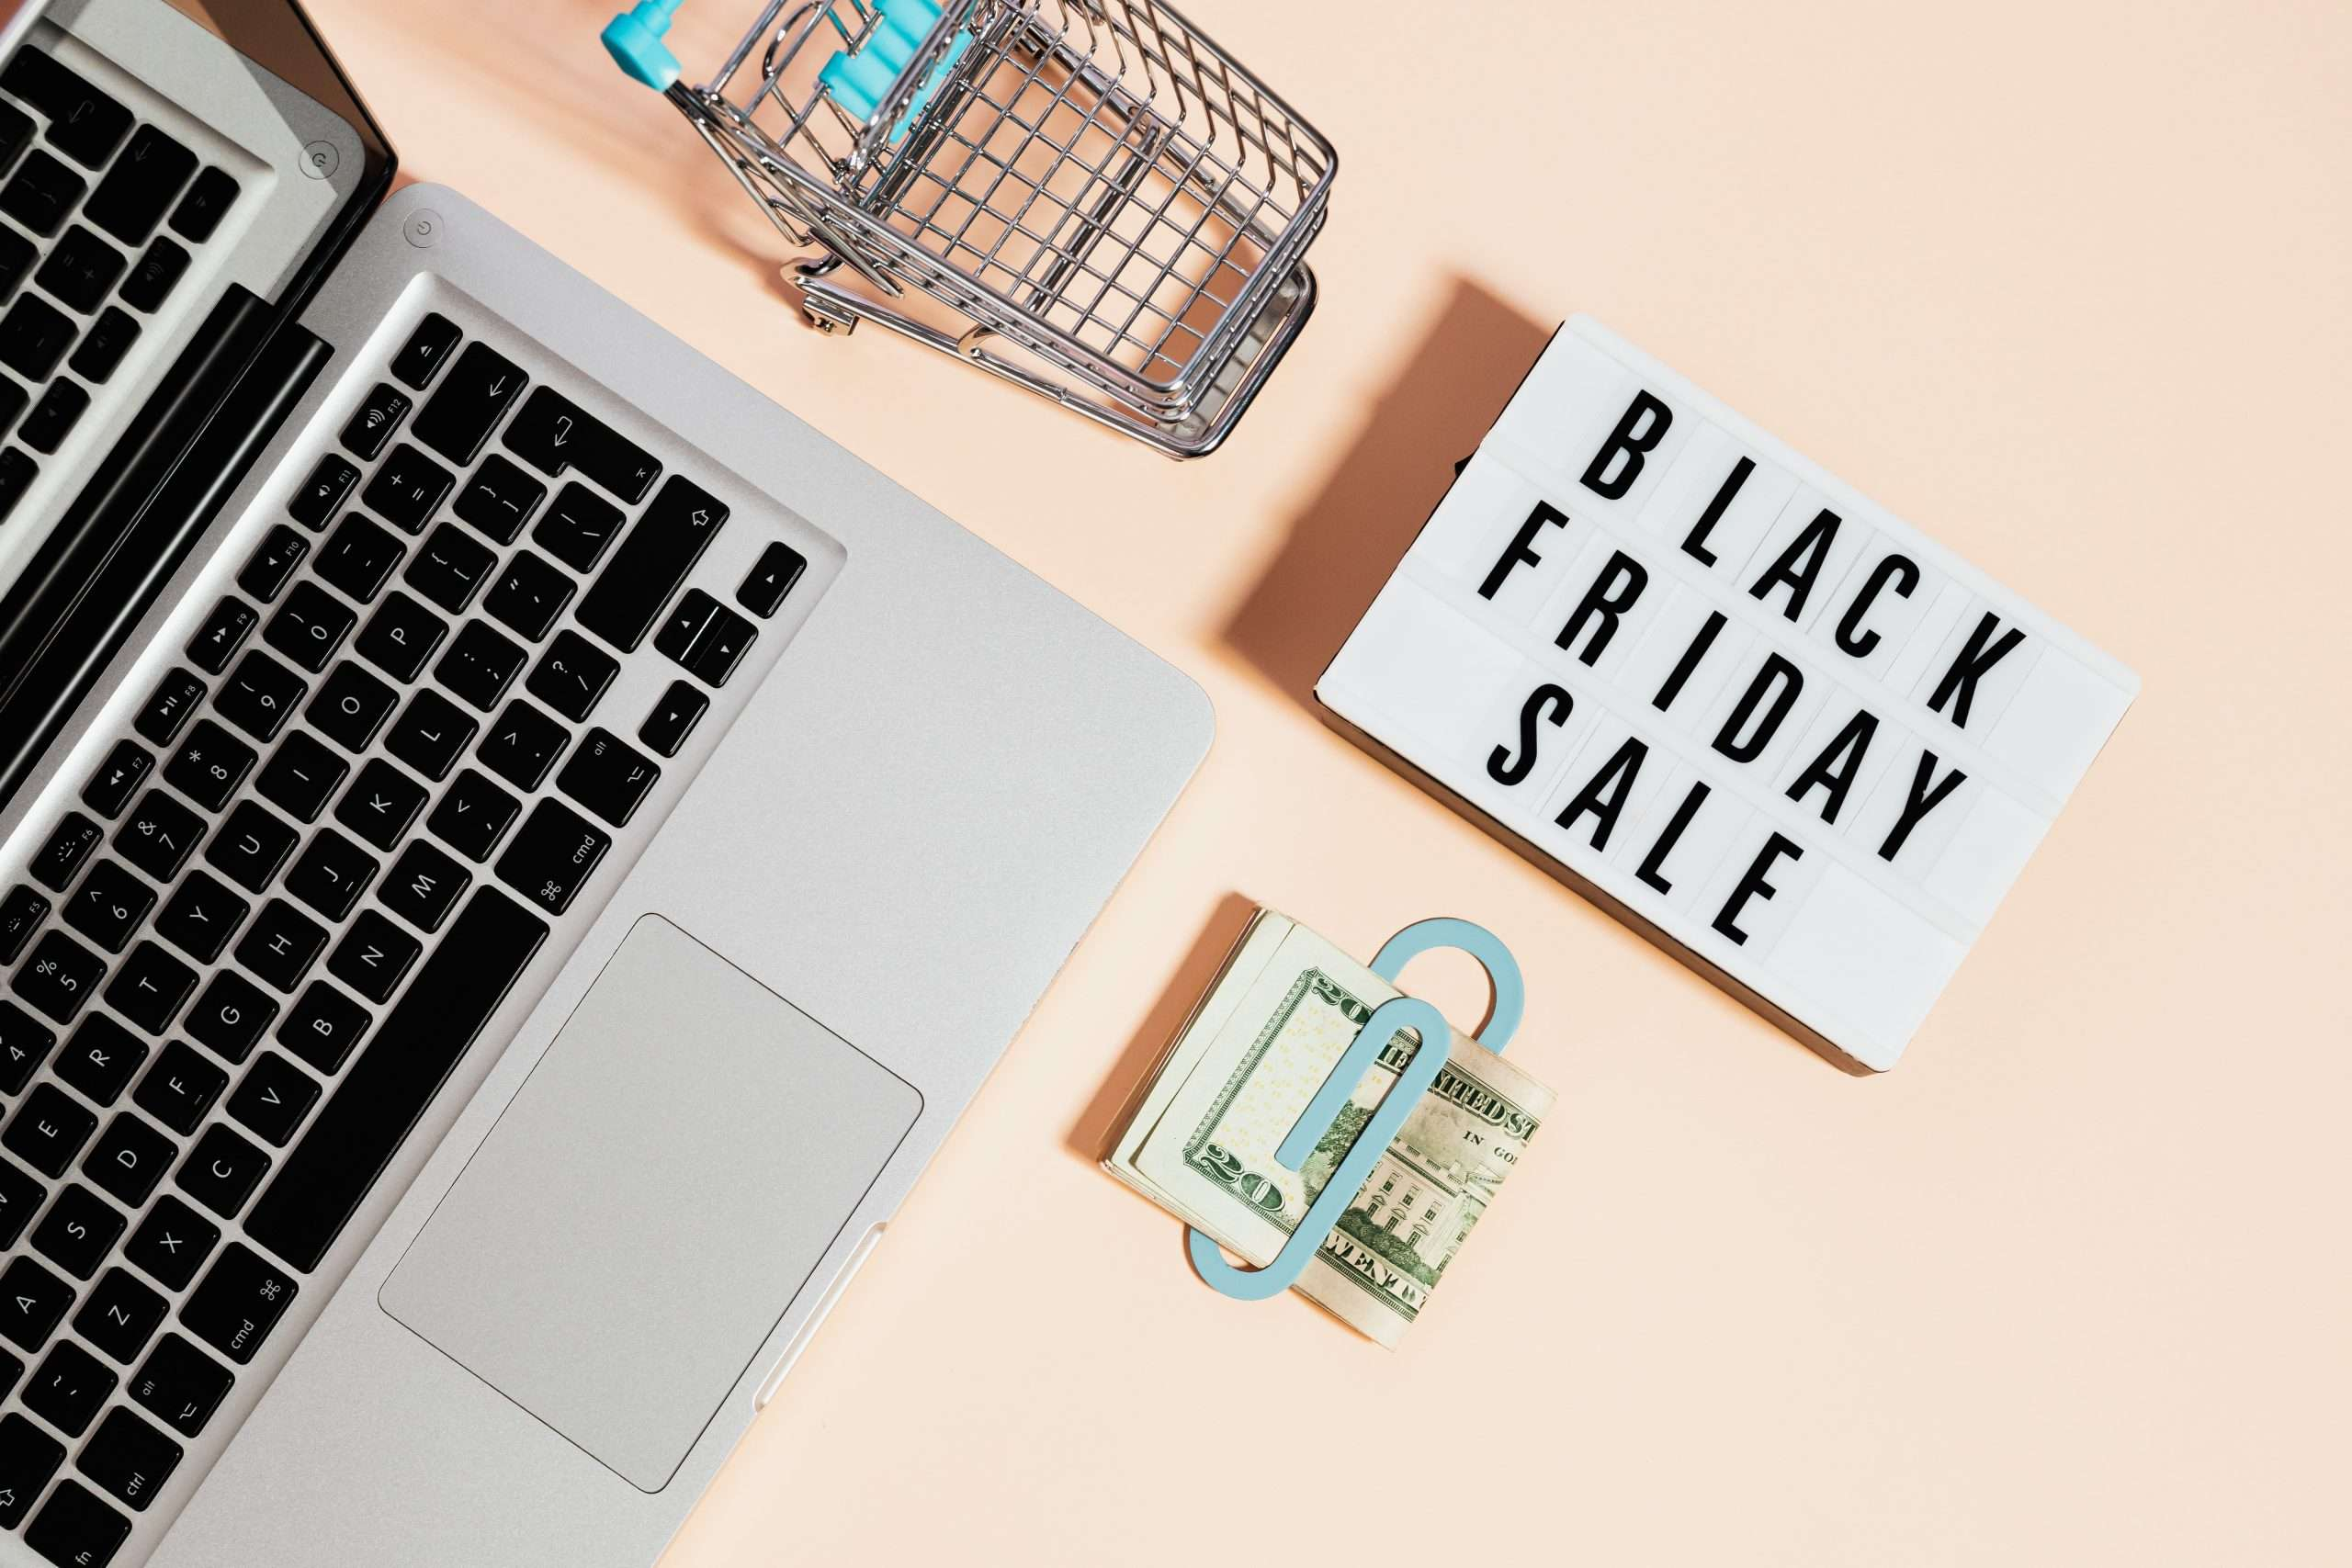 Black Friday: environmental impact